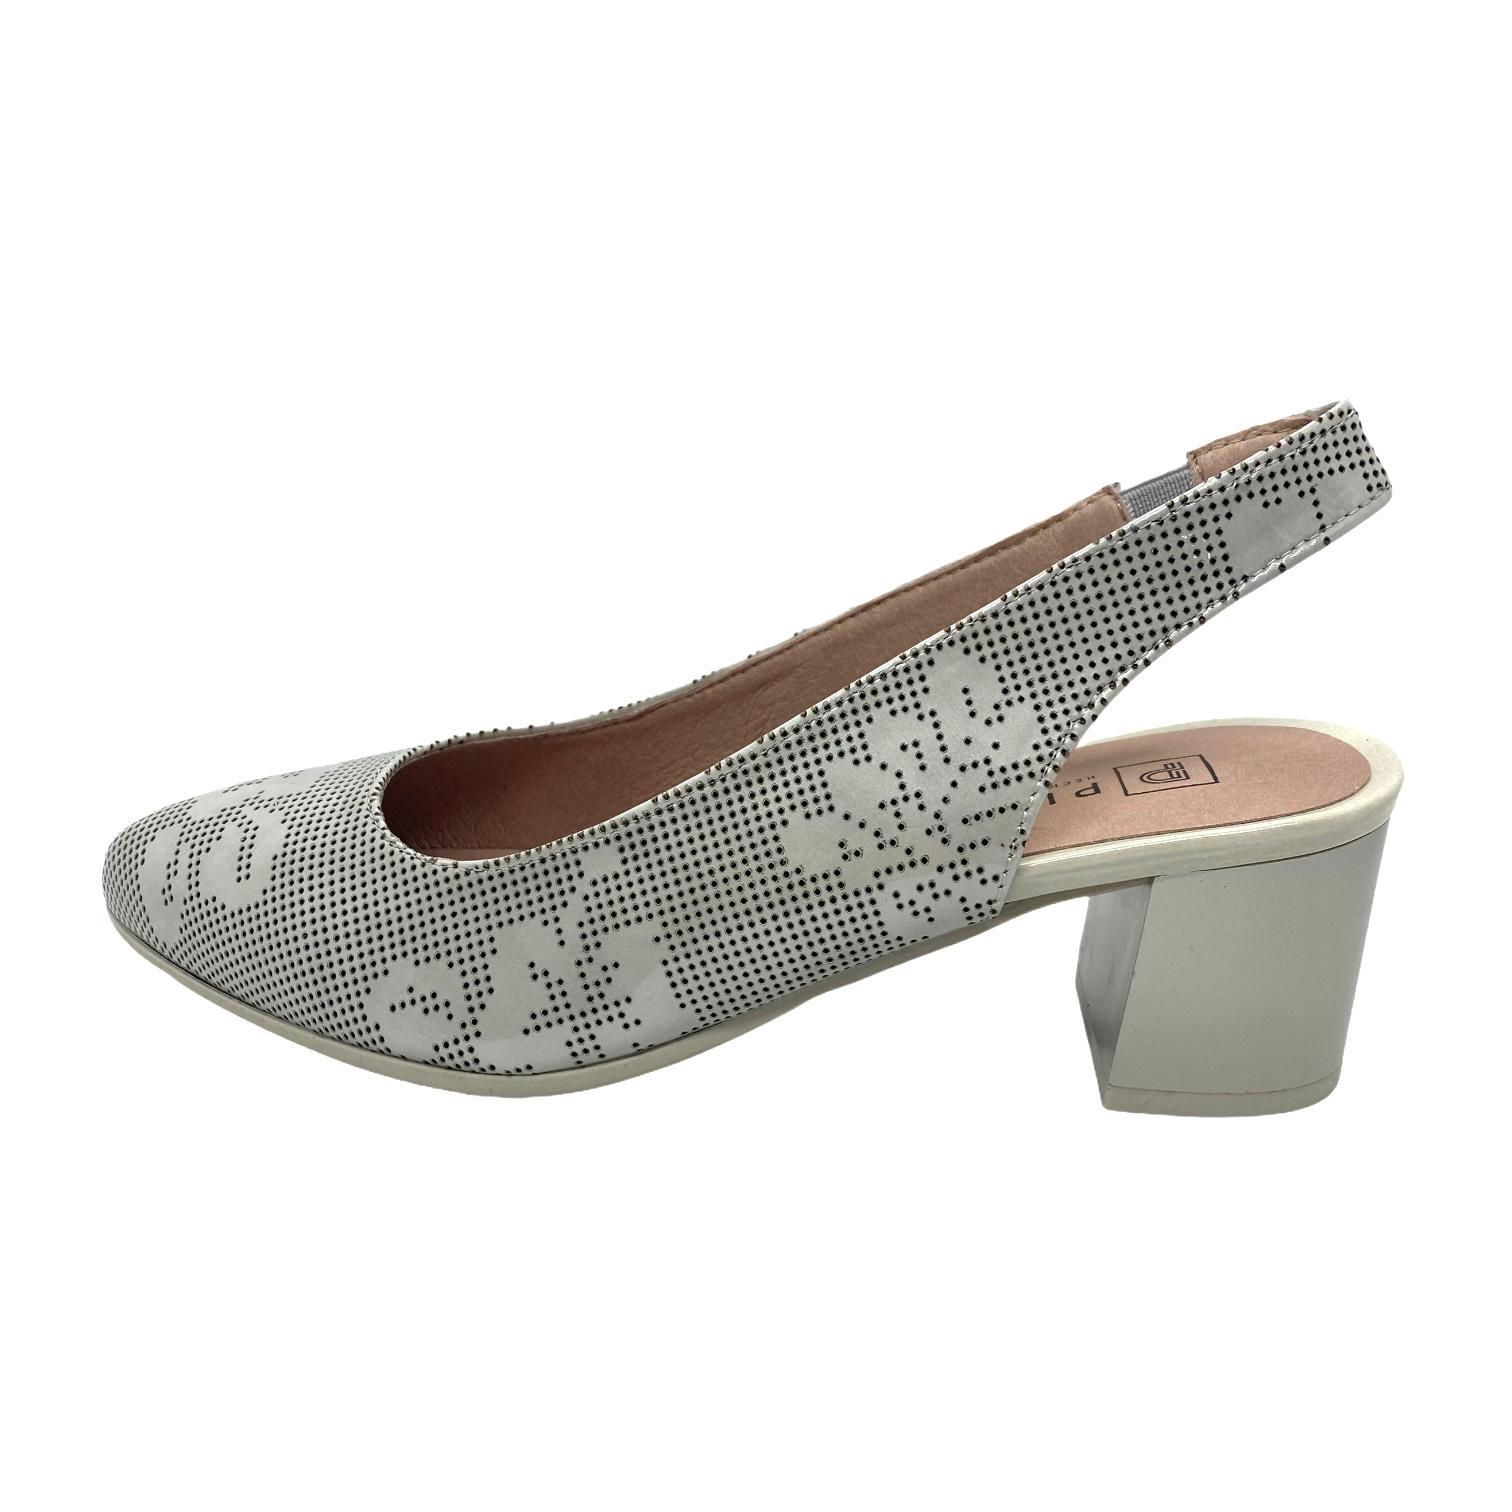 Pantofi decupati Pitillos gri cu perforatii si model